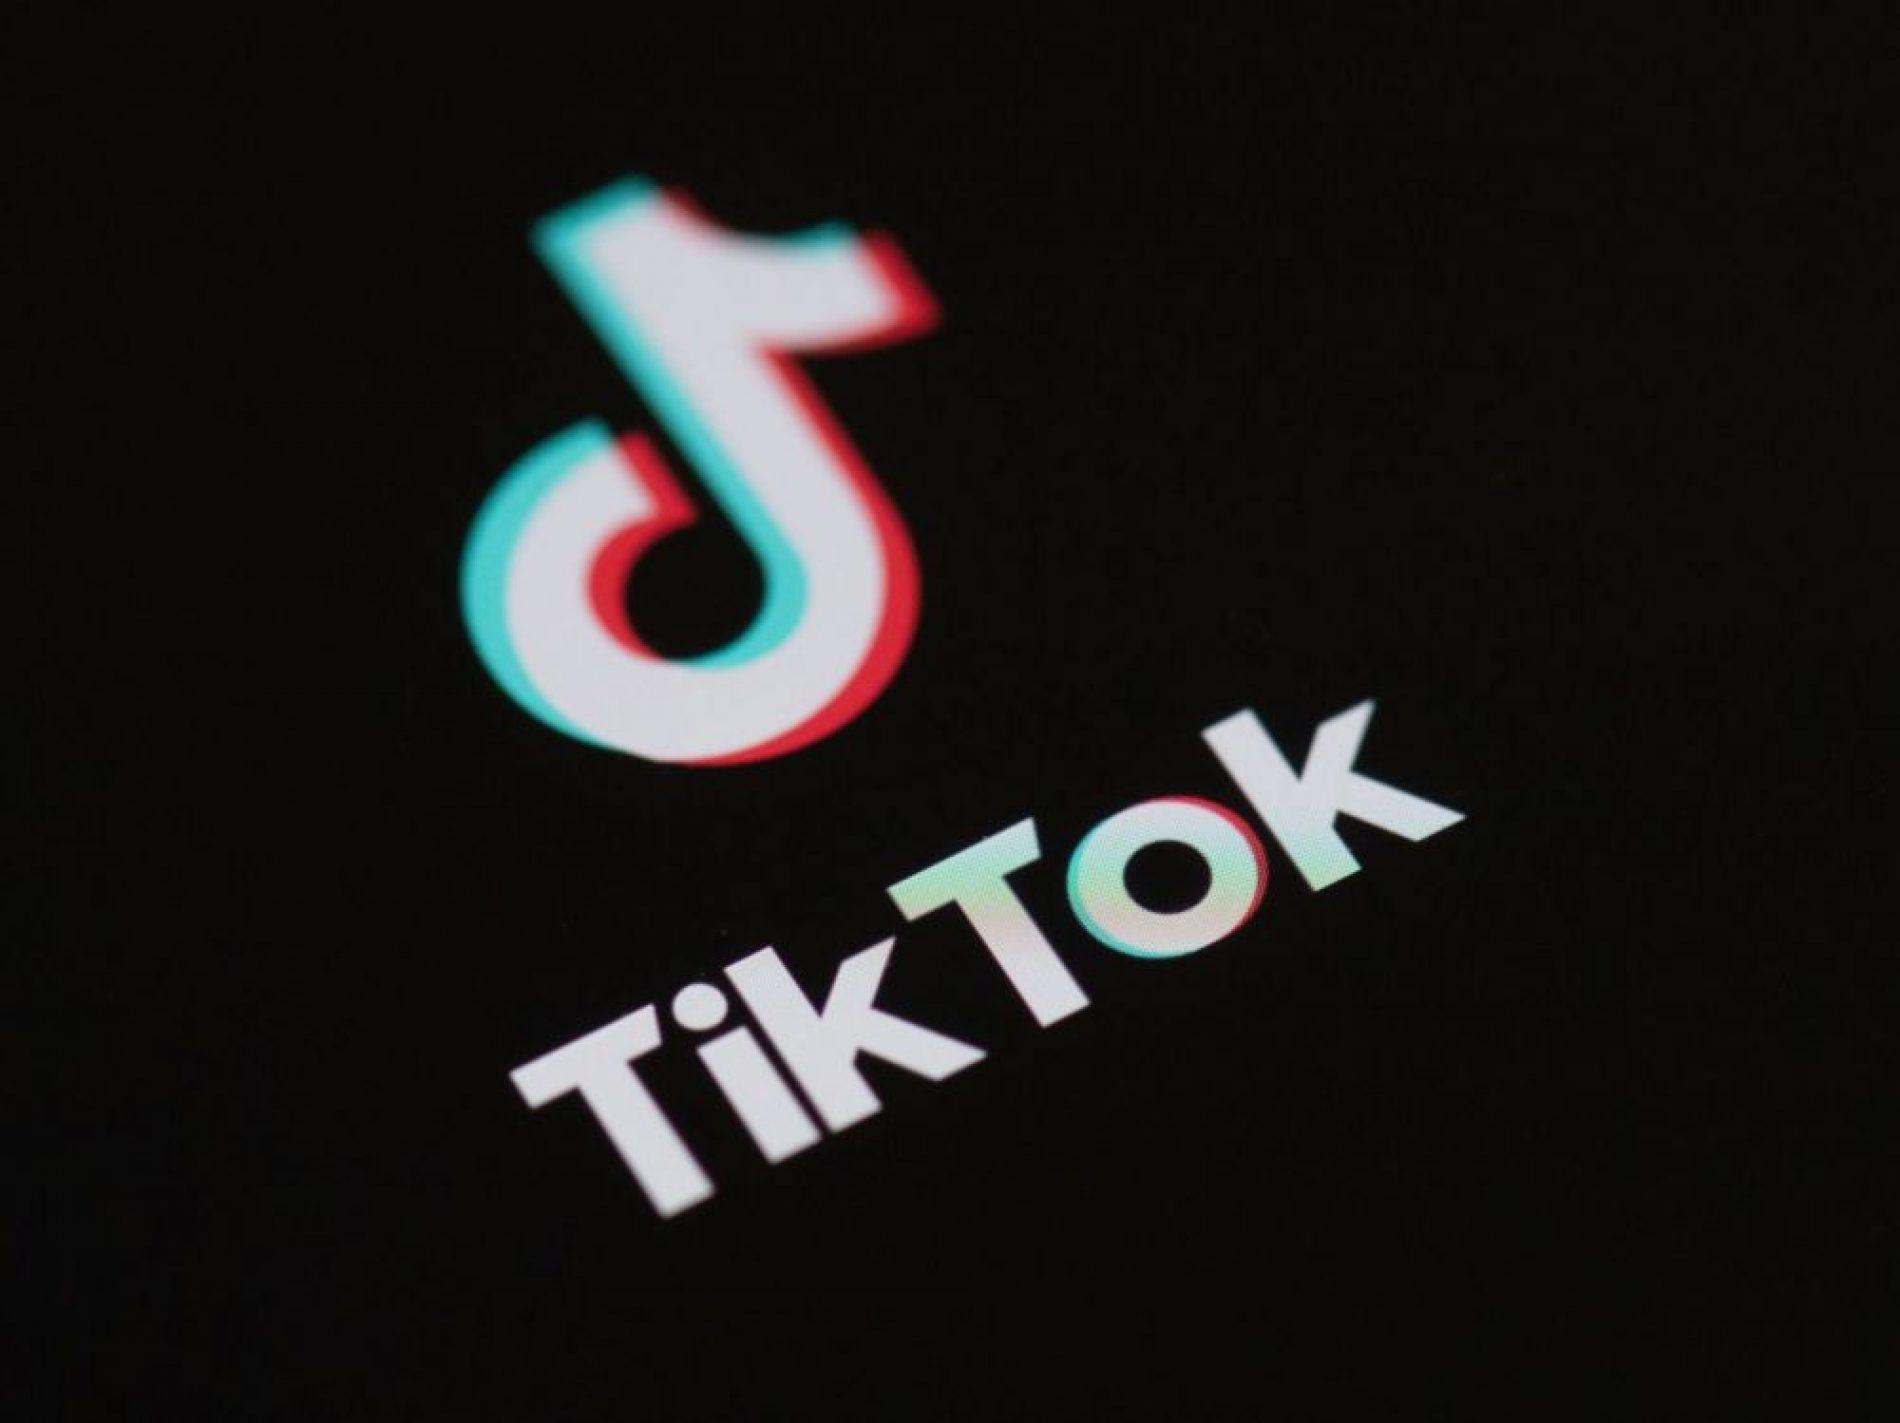 Fact-Checking : Tik Tok supprime 29k vidéos contenant des fake news sur la Covid19